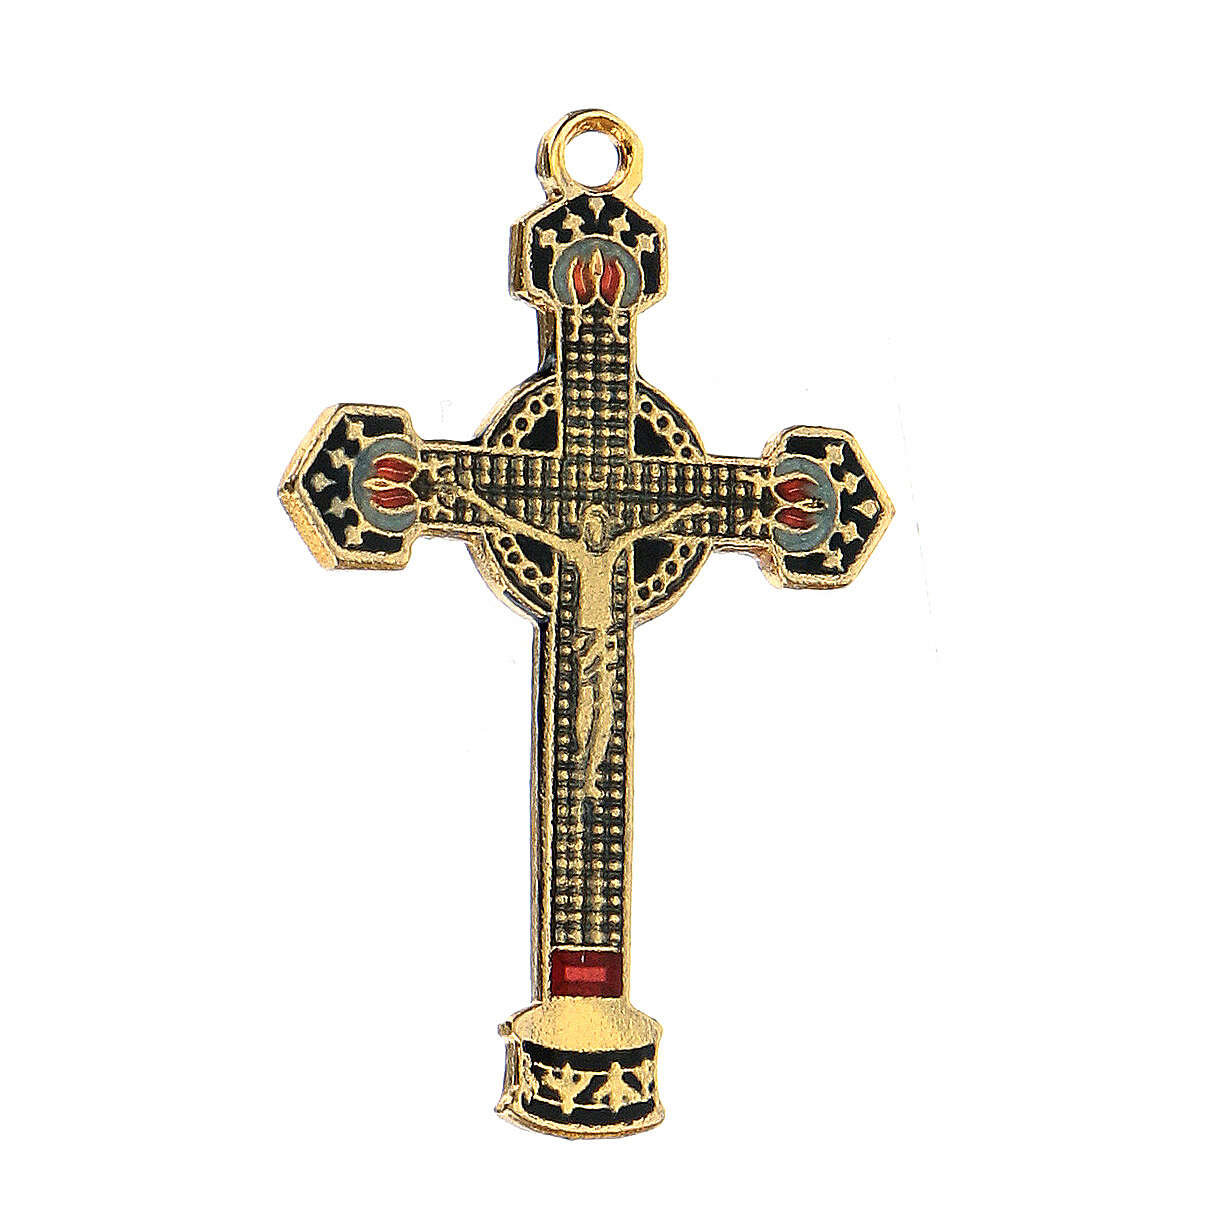 Enamelled crucifix pendant 4